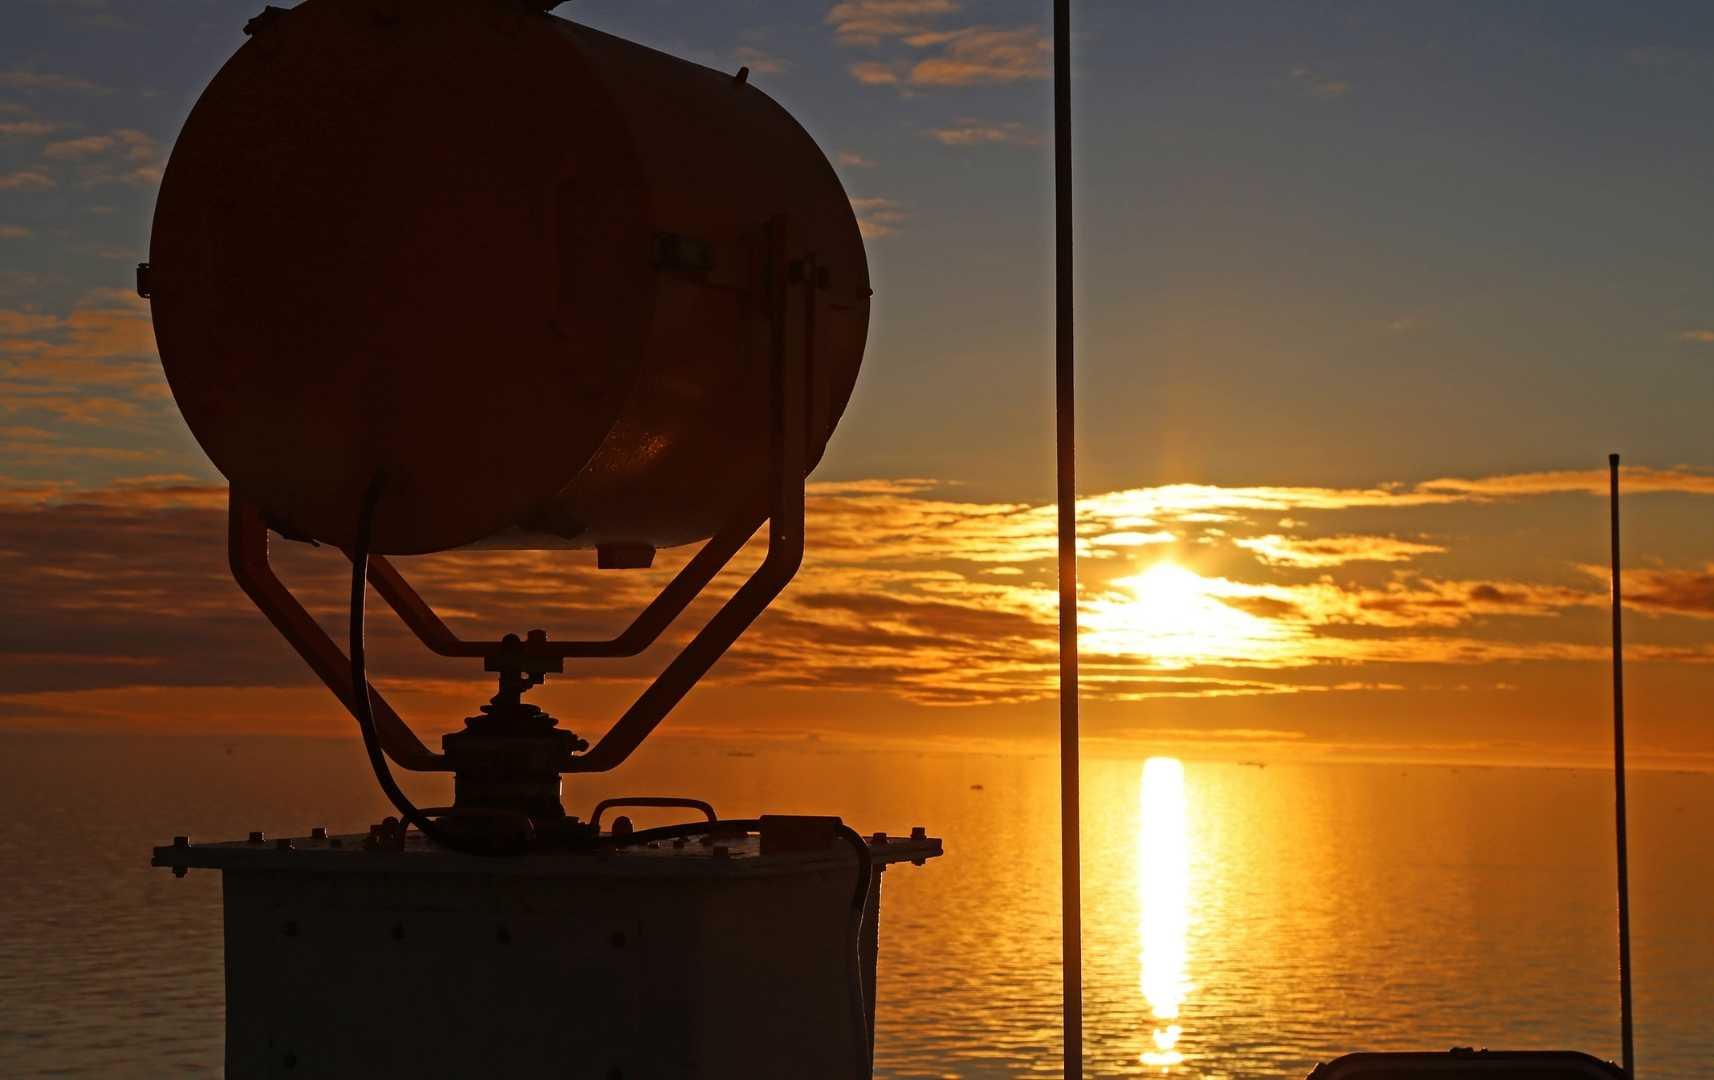 Sonnenuntergang an Bord der MS Hanseatic